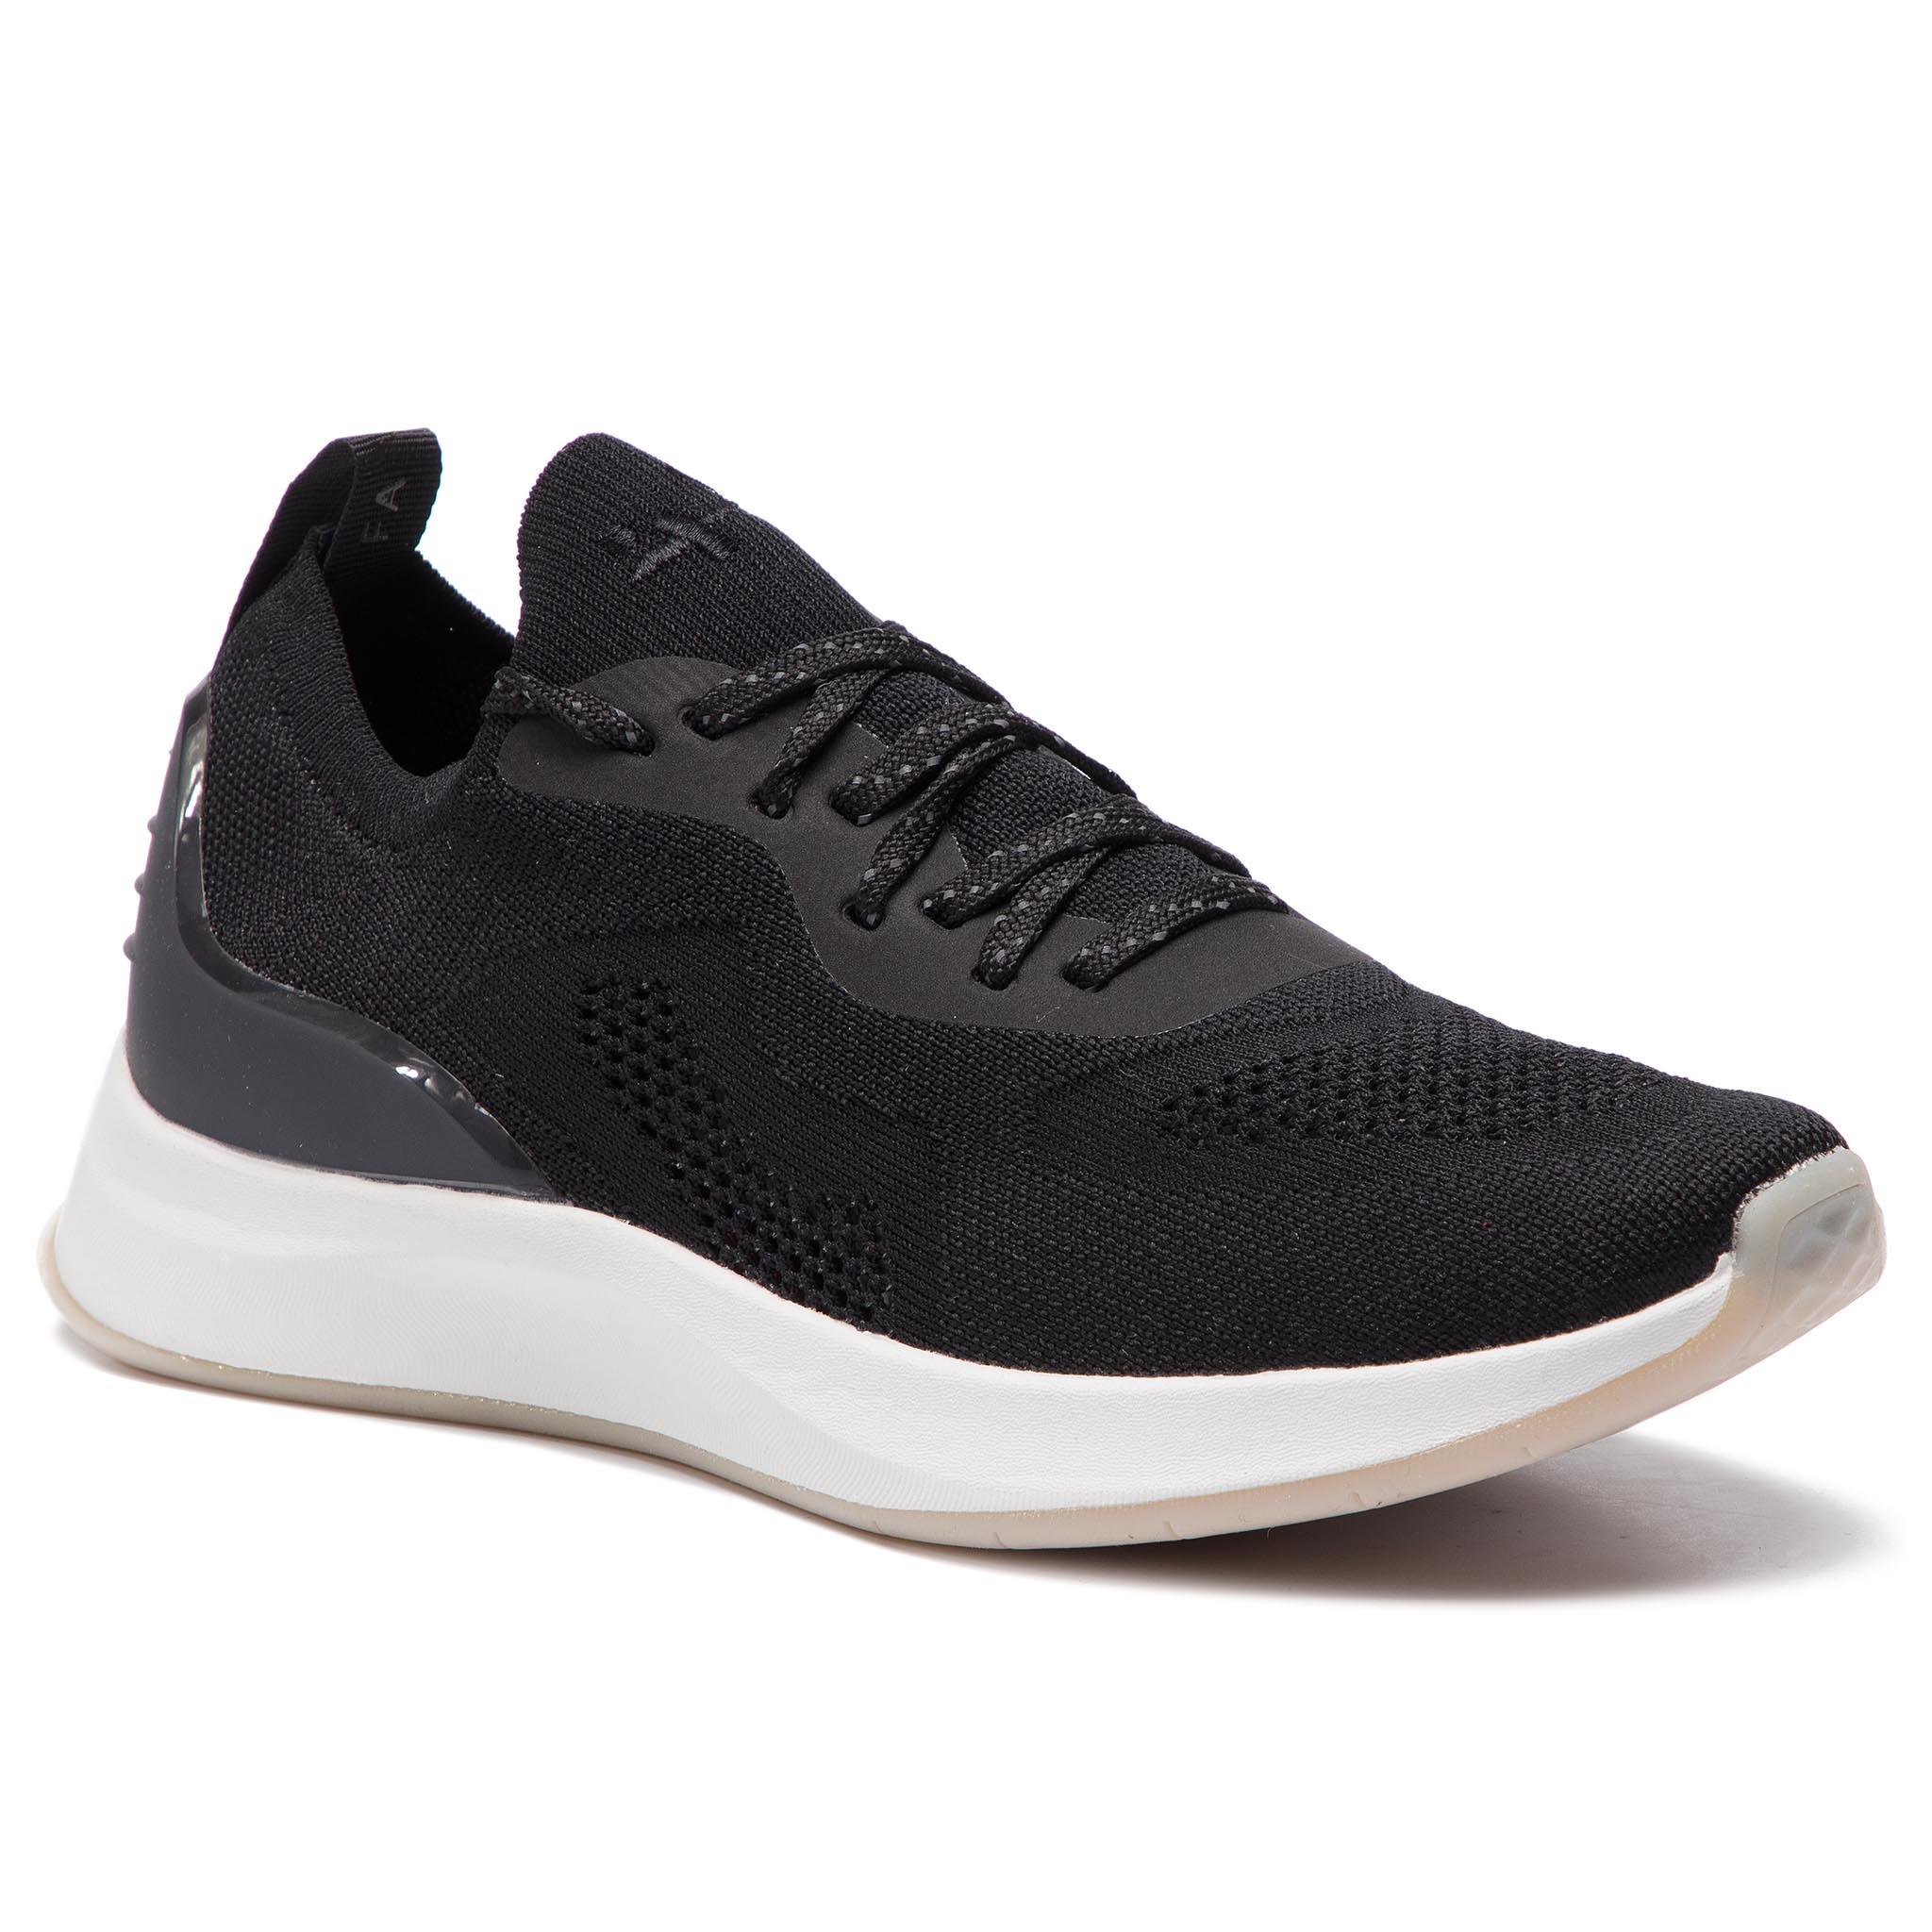 Sneakers TAMARIS 1 23782 33 BlkOlivie Leo 076 Sneakers